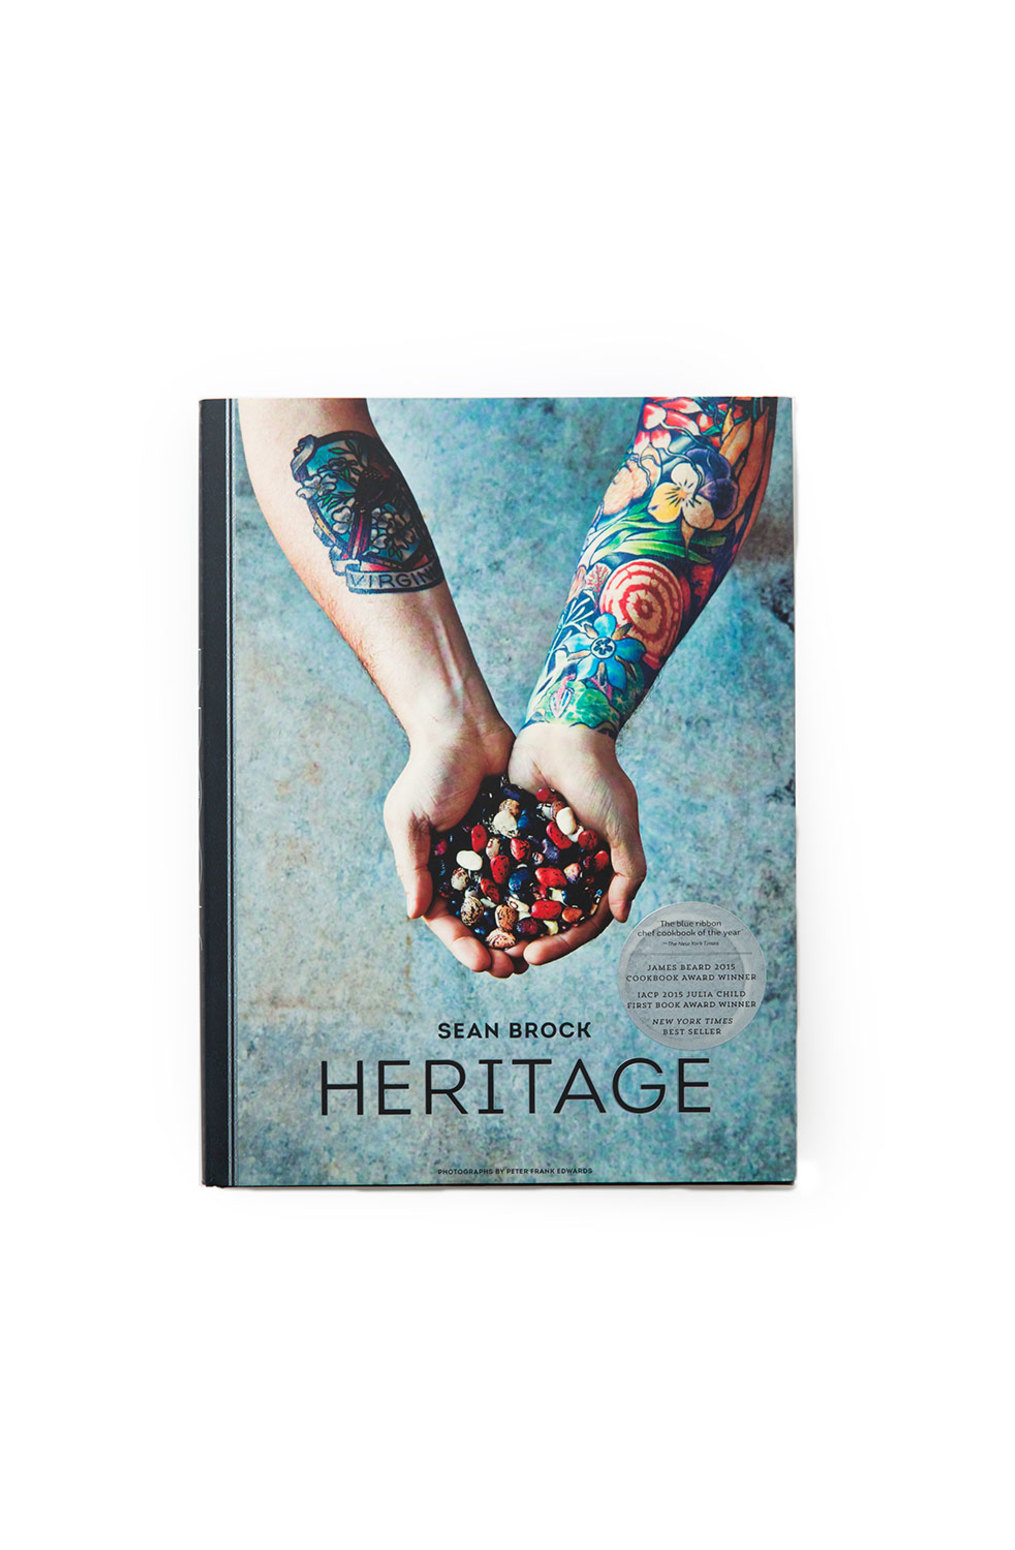 Alabama chanin heritage cookbook by sean brock 1